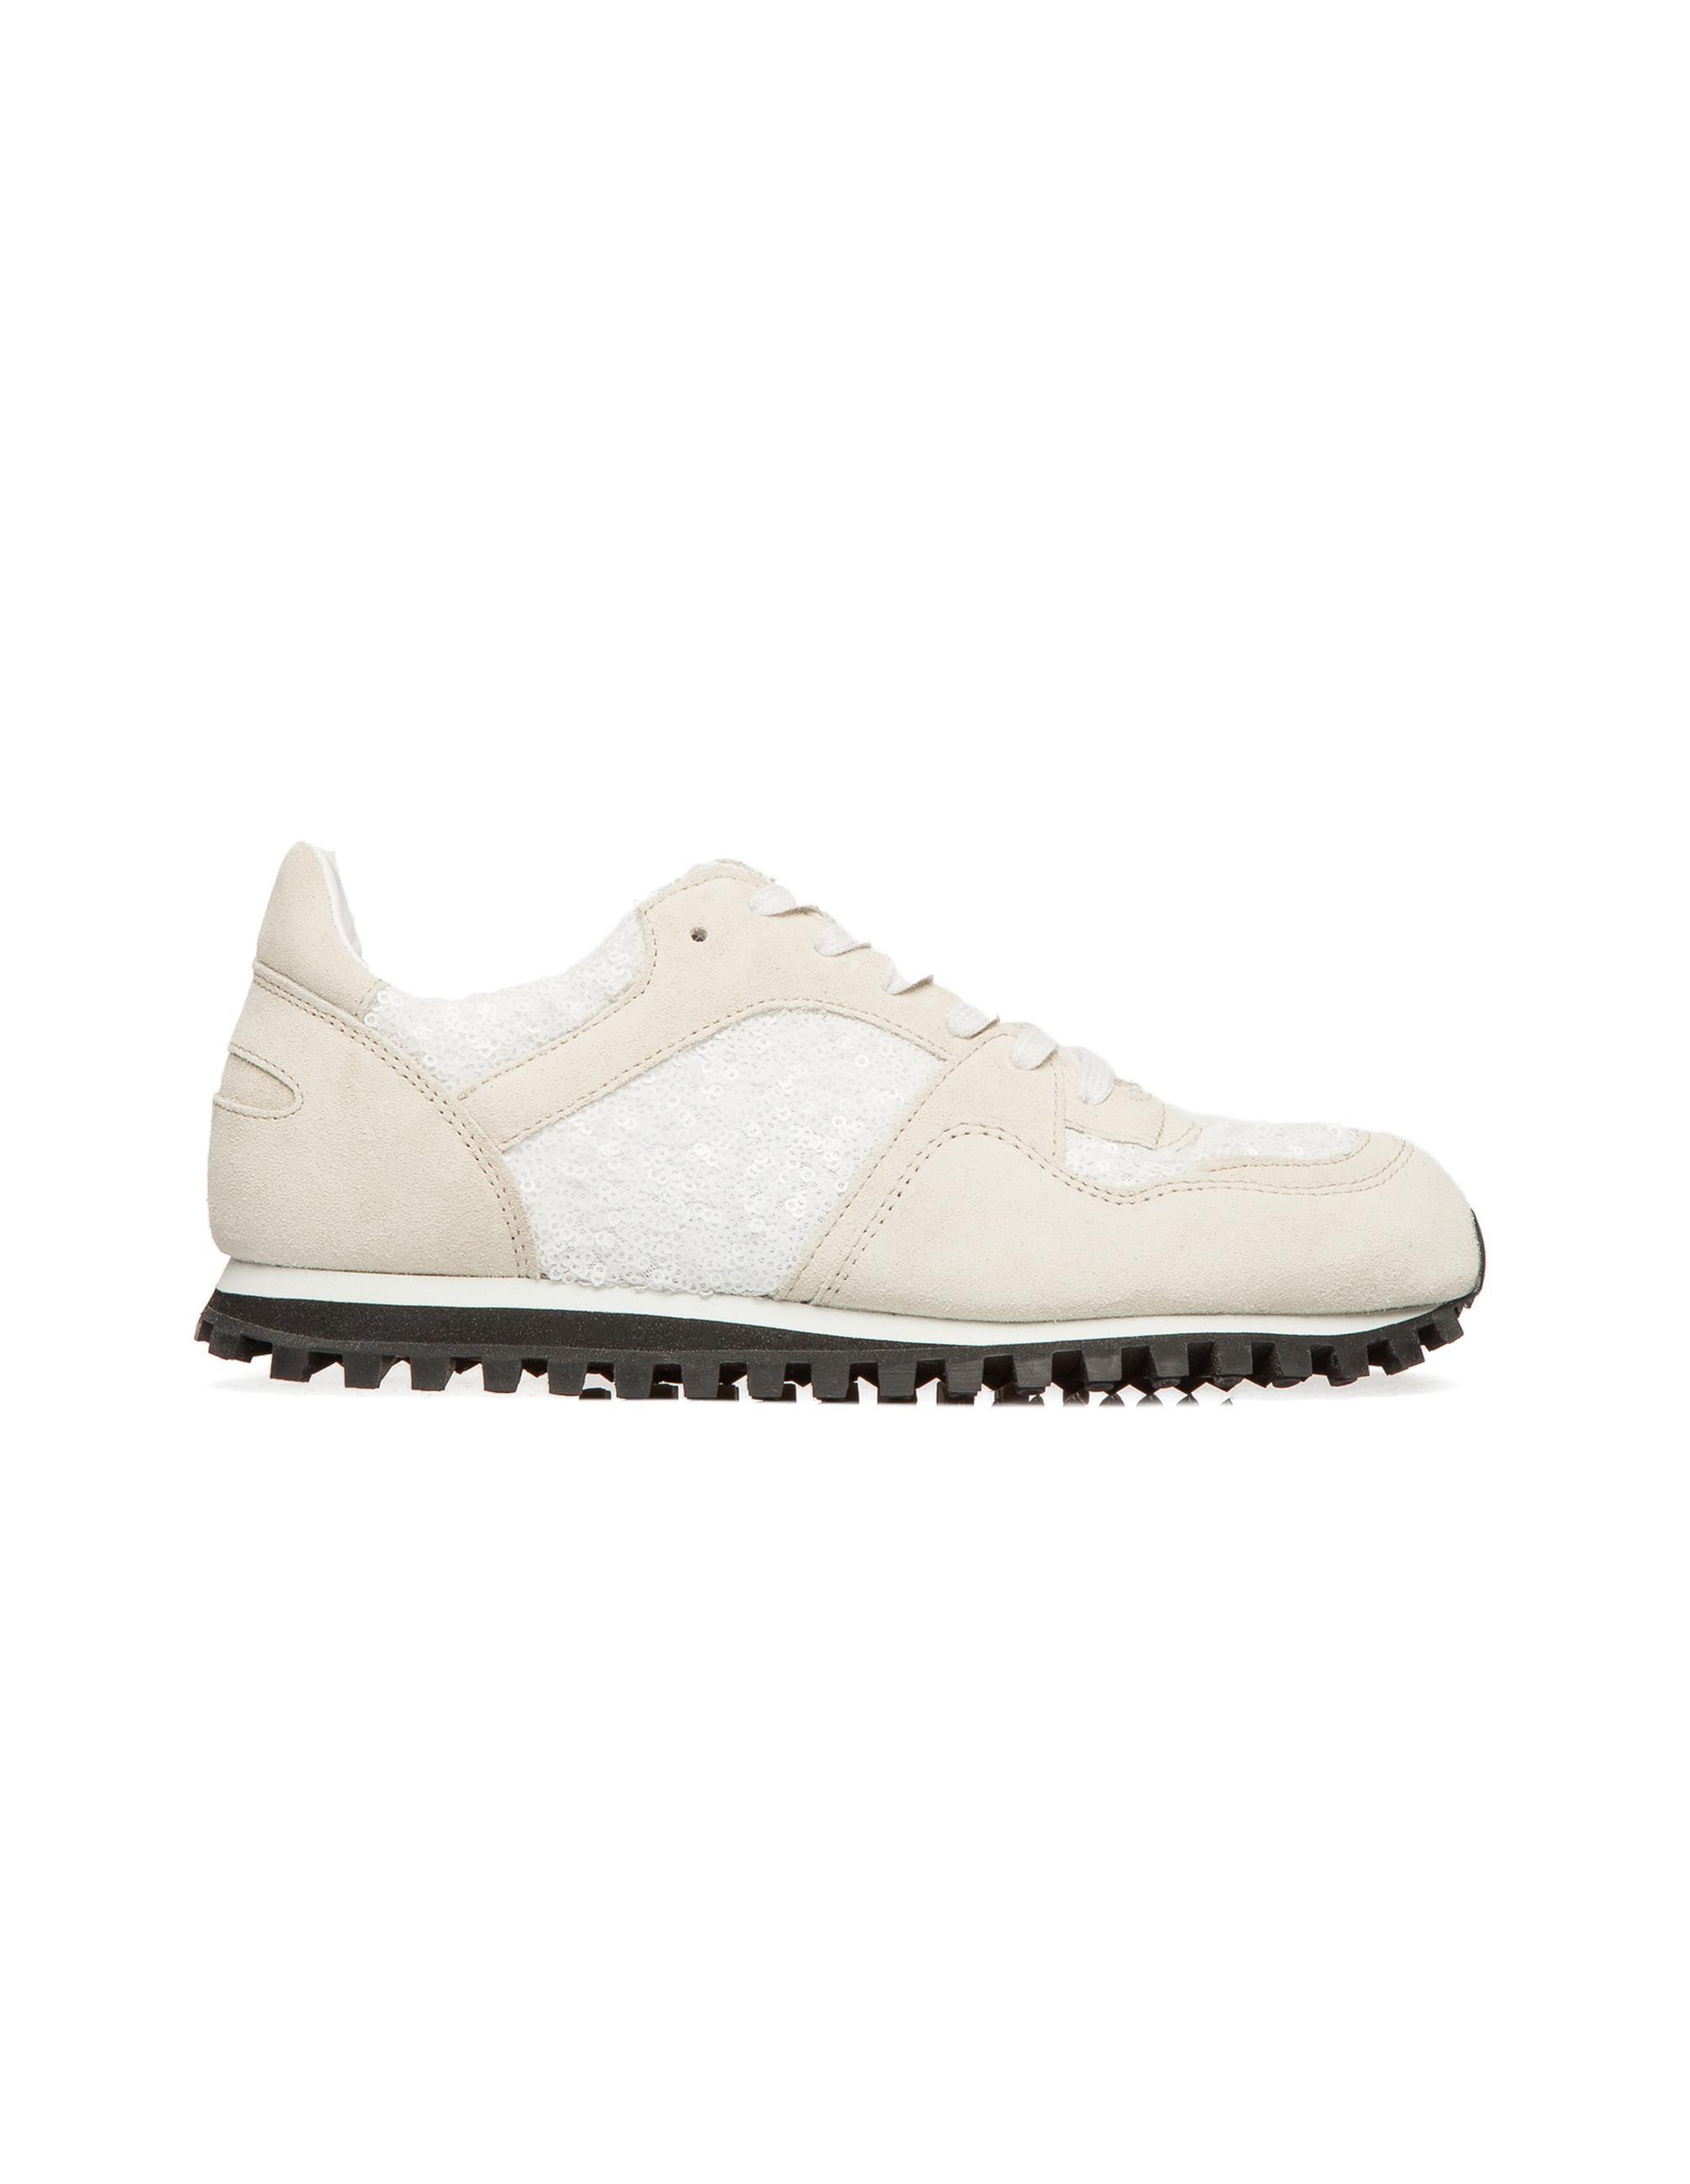 028b2bda3a29 Comme des Garçons Cdg X Spalwart Sneakers in White - Lyst